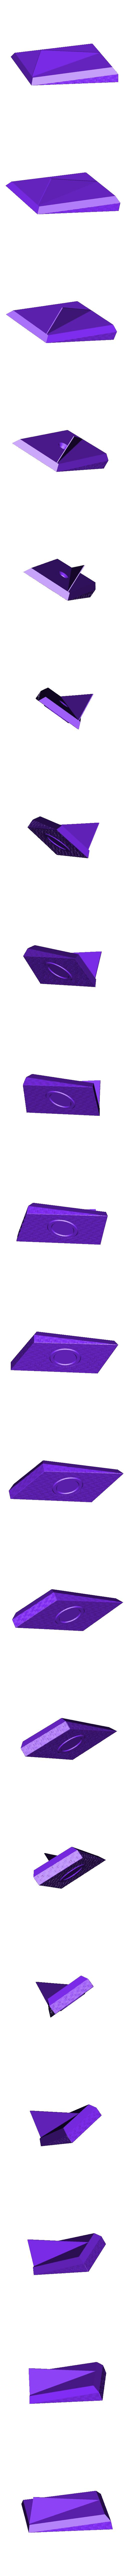 07.PDC's Bay.stl Download STL file Anubis • 3D print template, sergusy